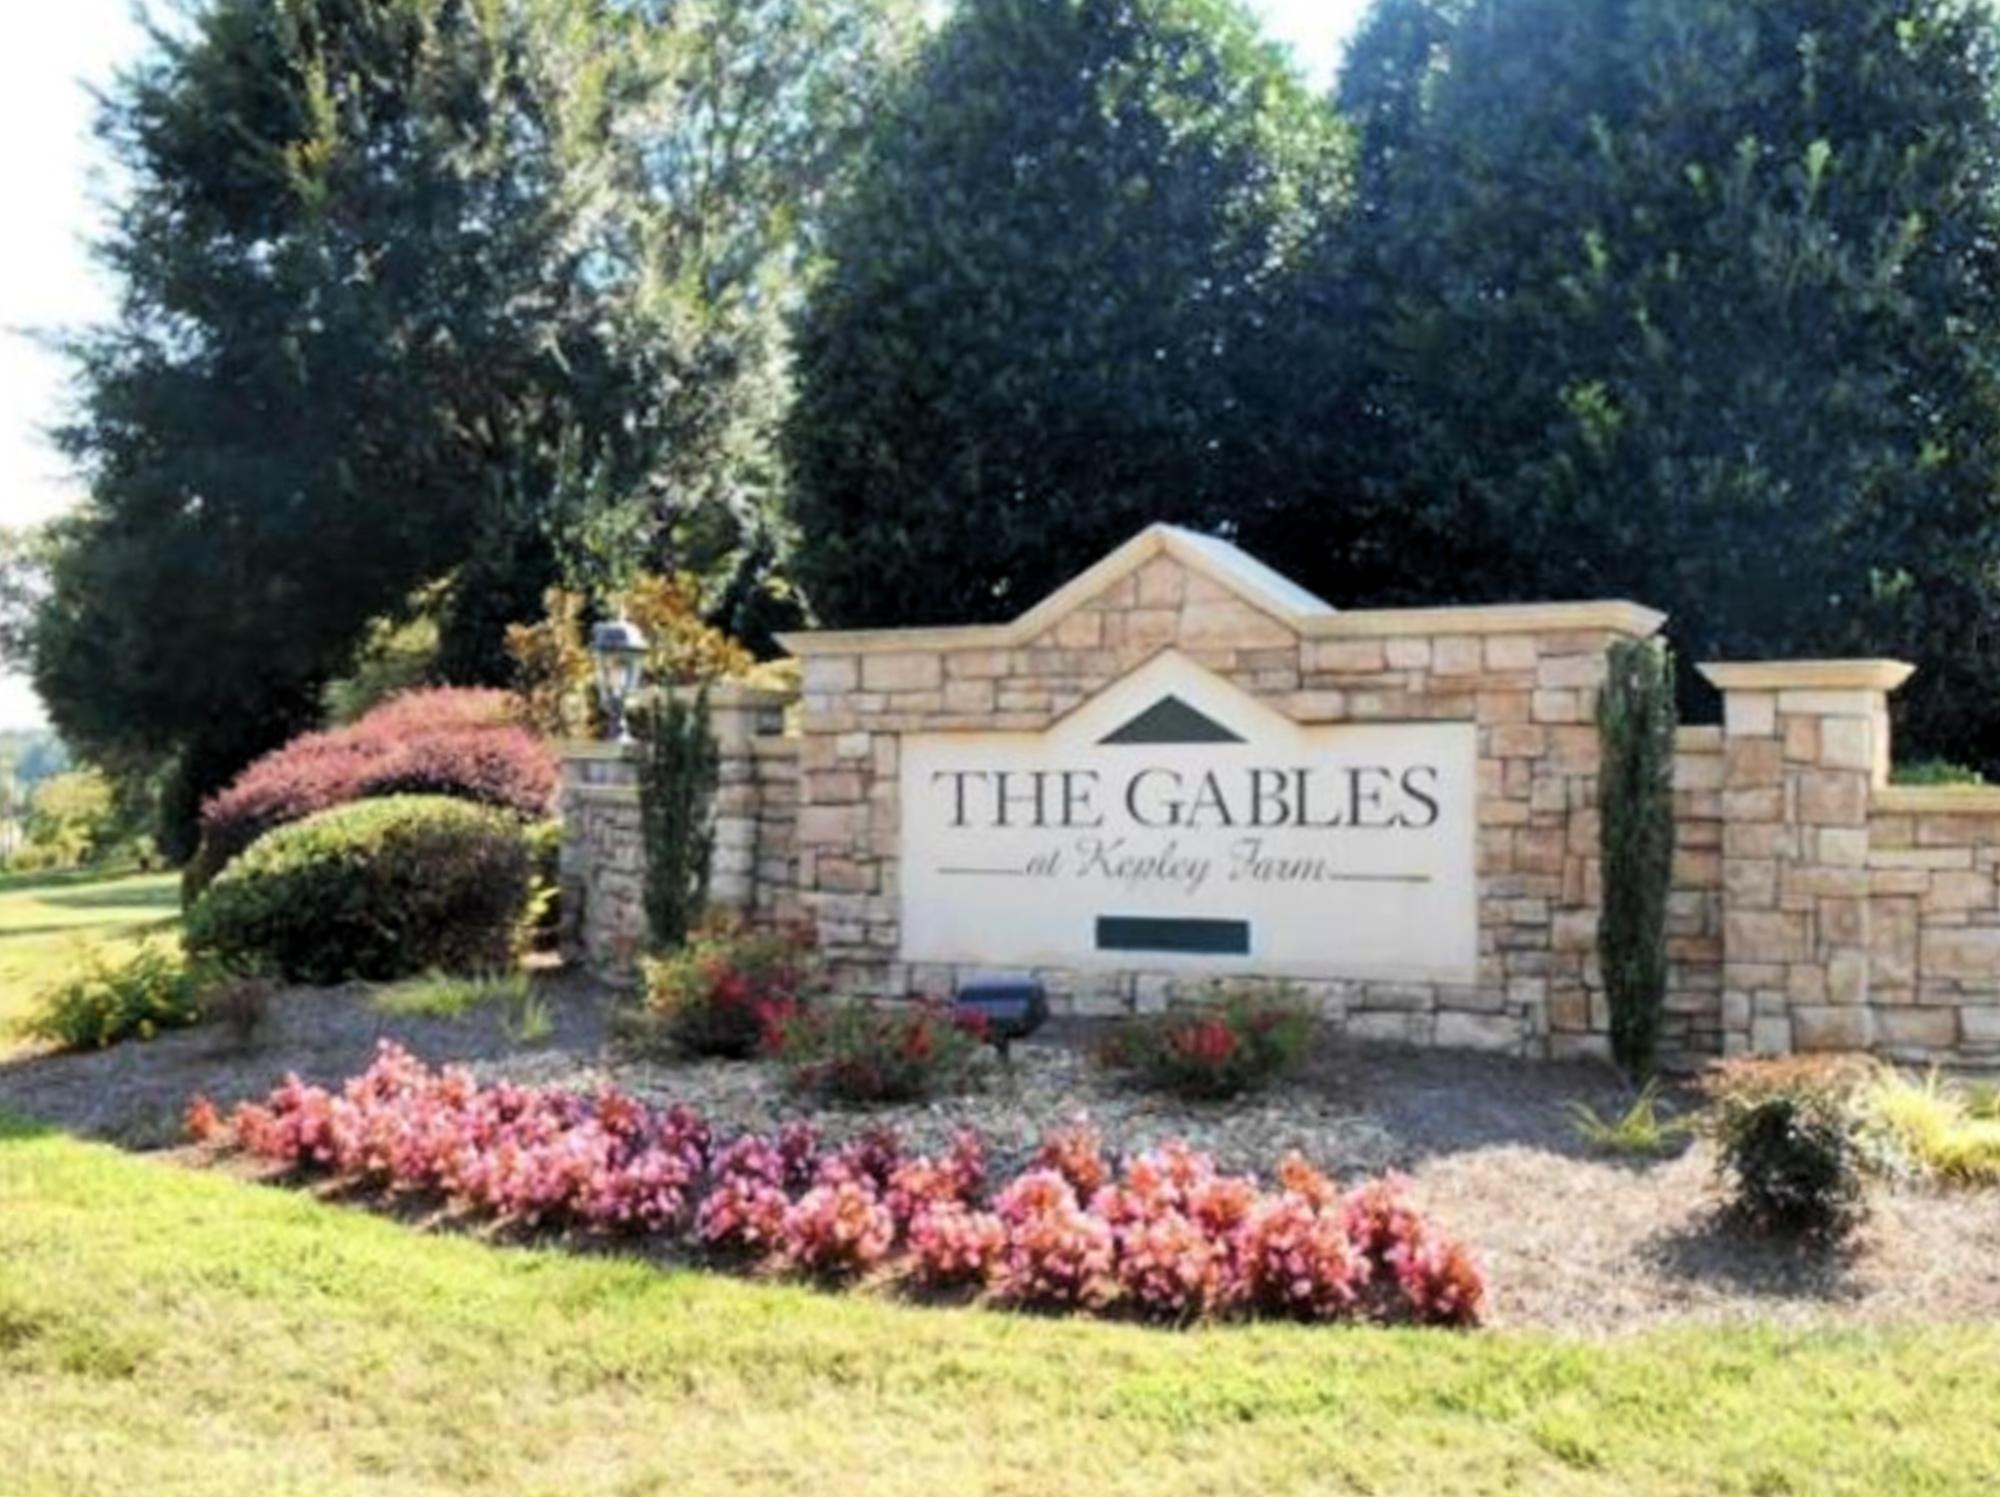 The Gables at Kepley Farm